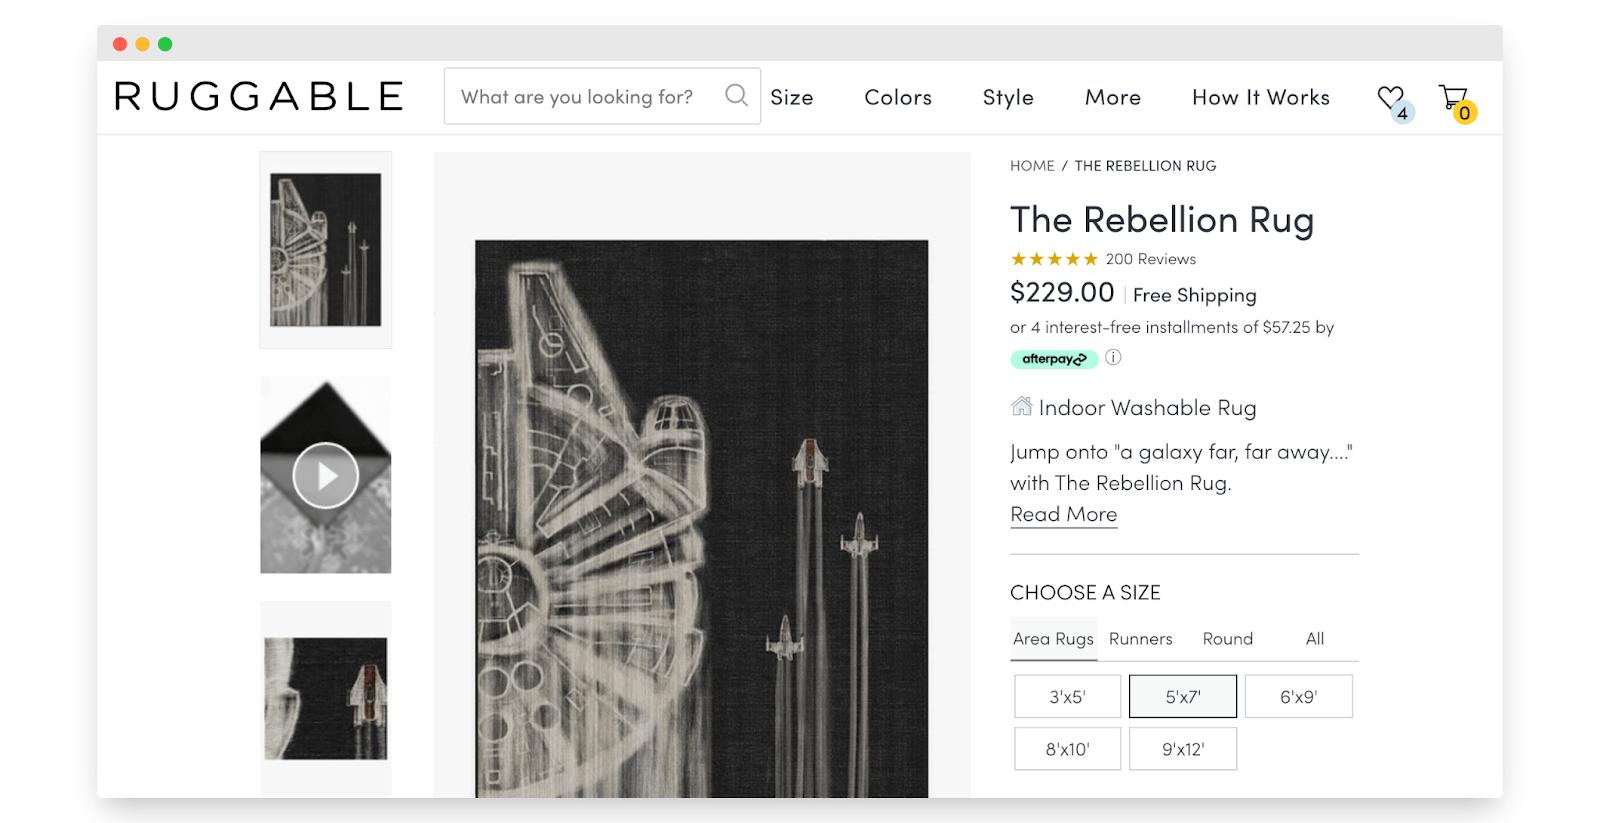 Star Wars Ruggable merchandising